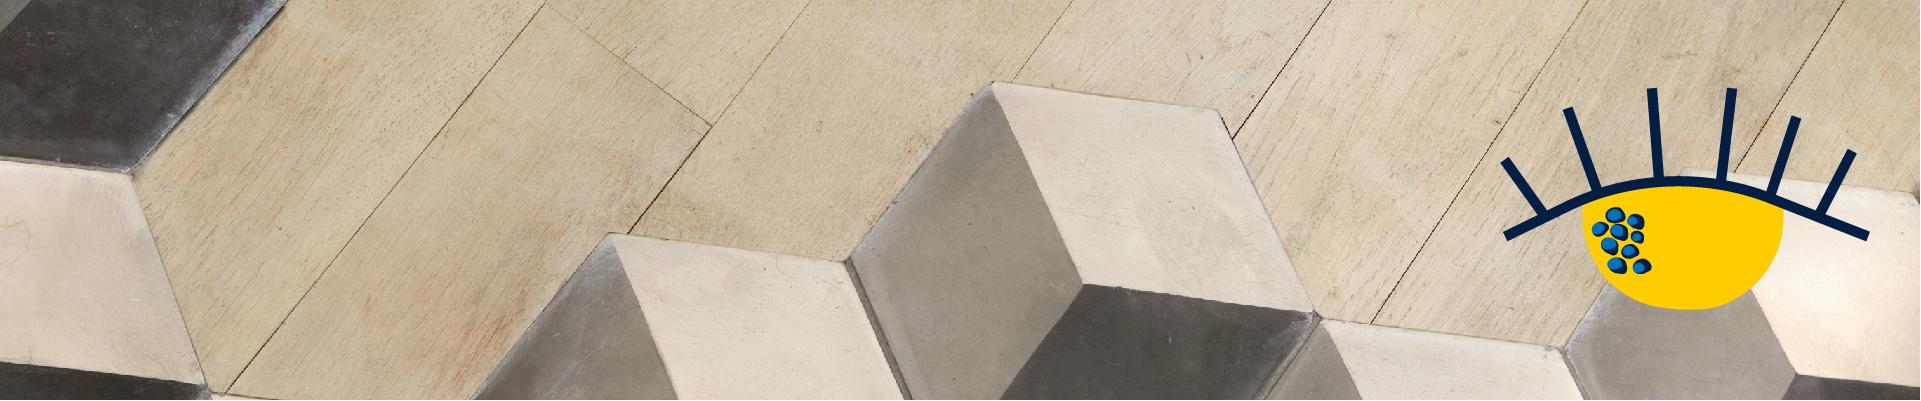 blocs-bois-design